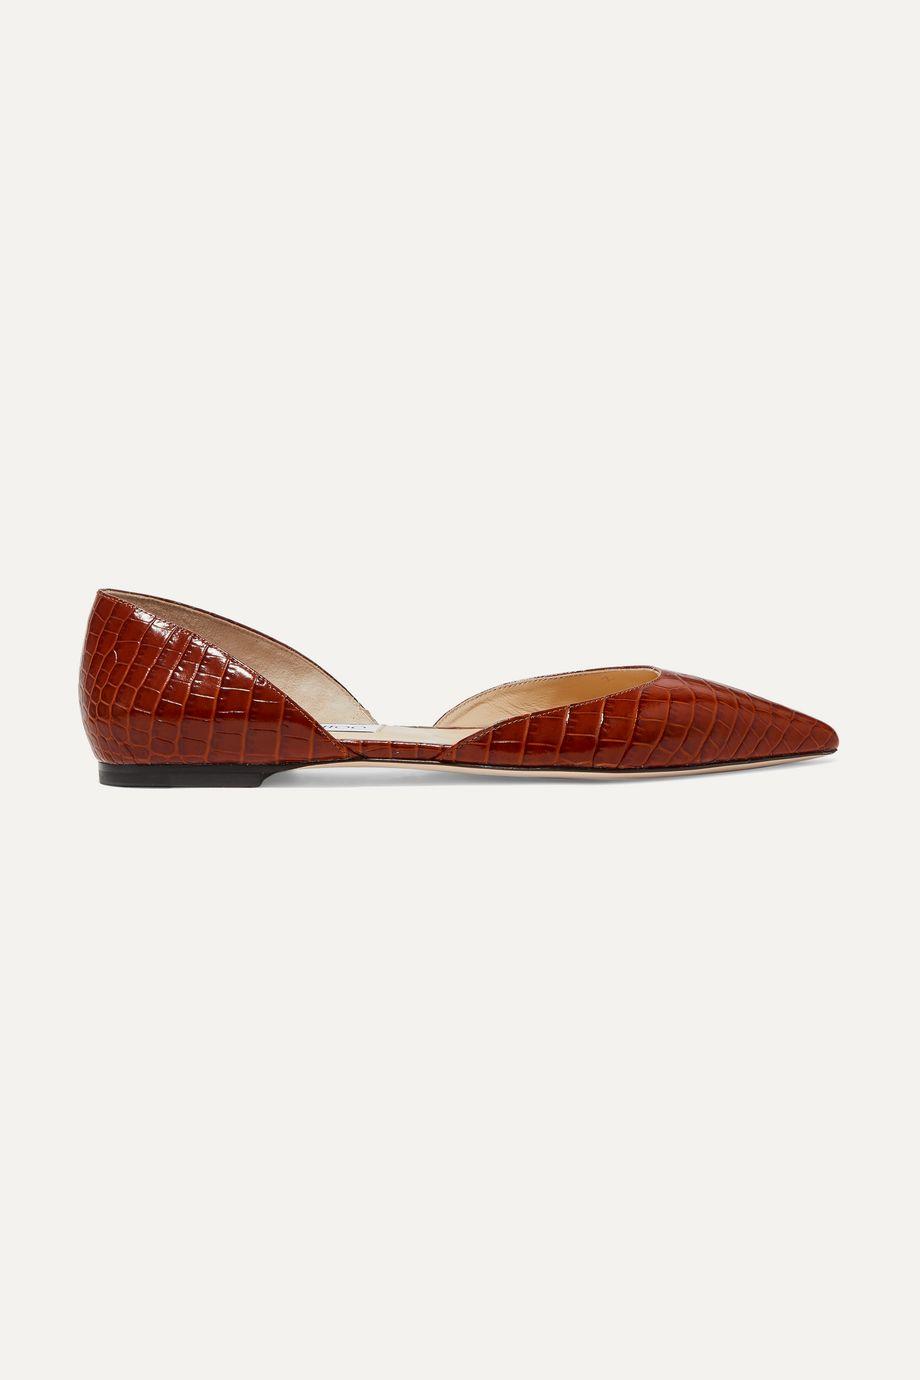 Jimmy Choo Esther croc-effect leather ballet flats